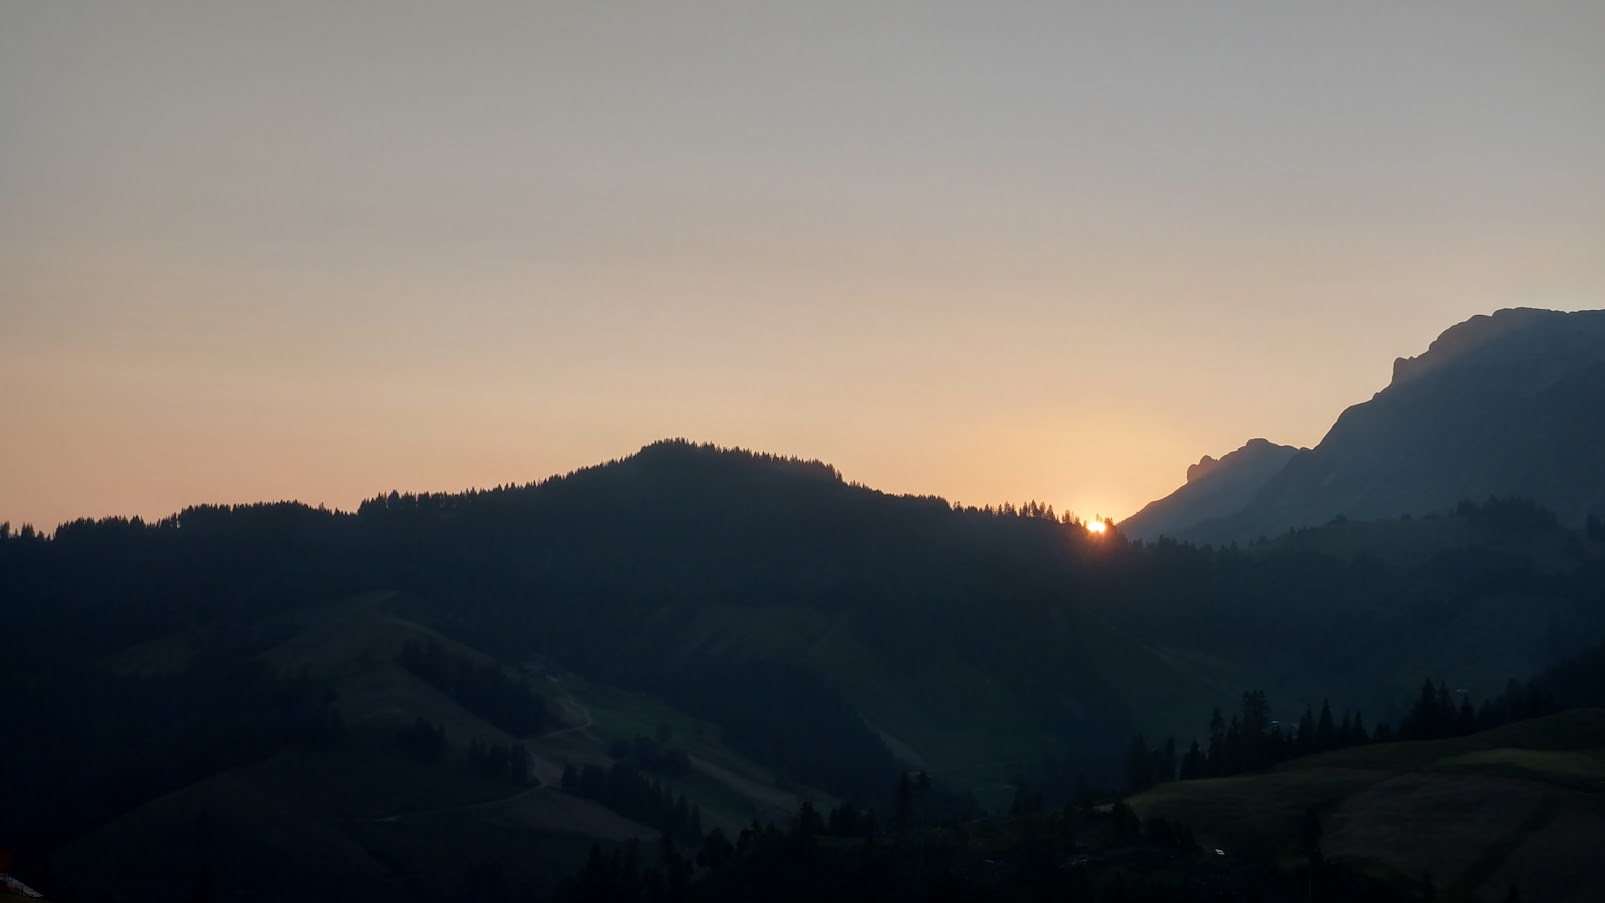 Sonnenaufgang....immer ein Highlight